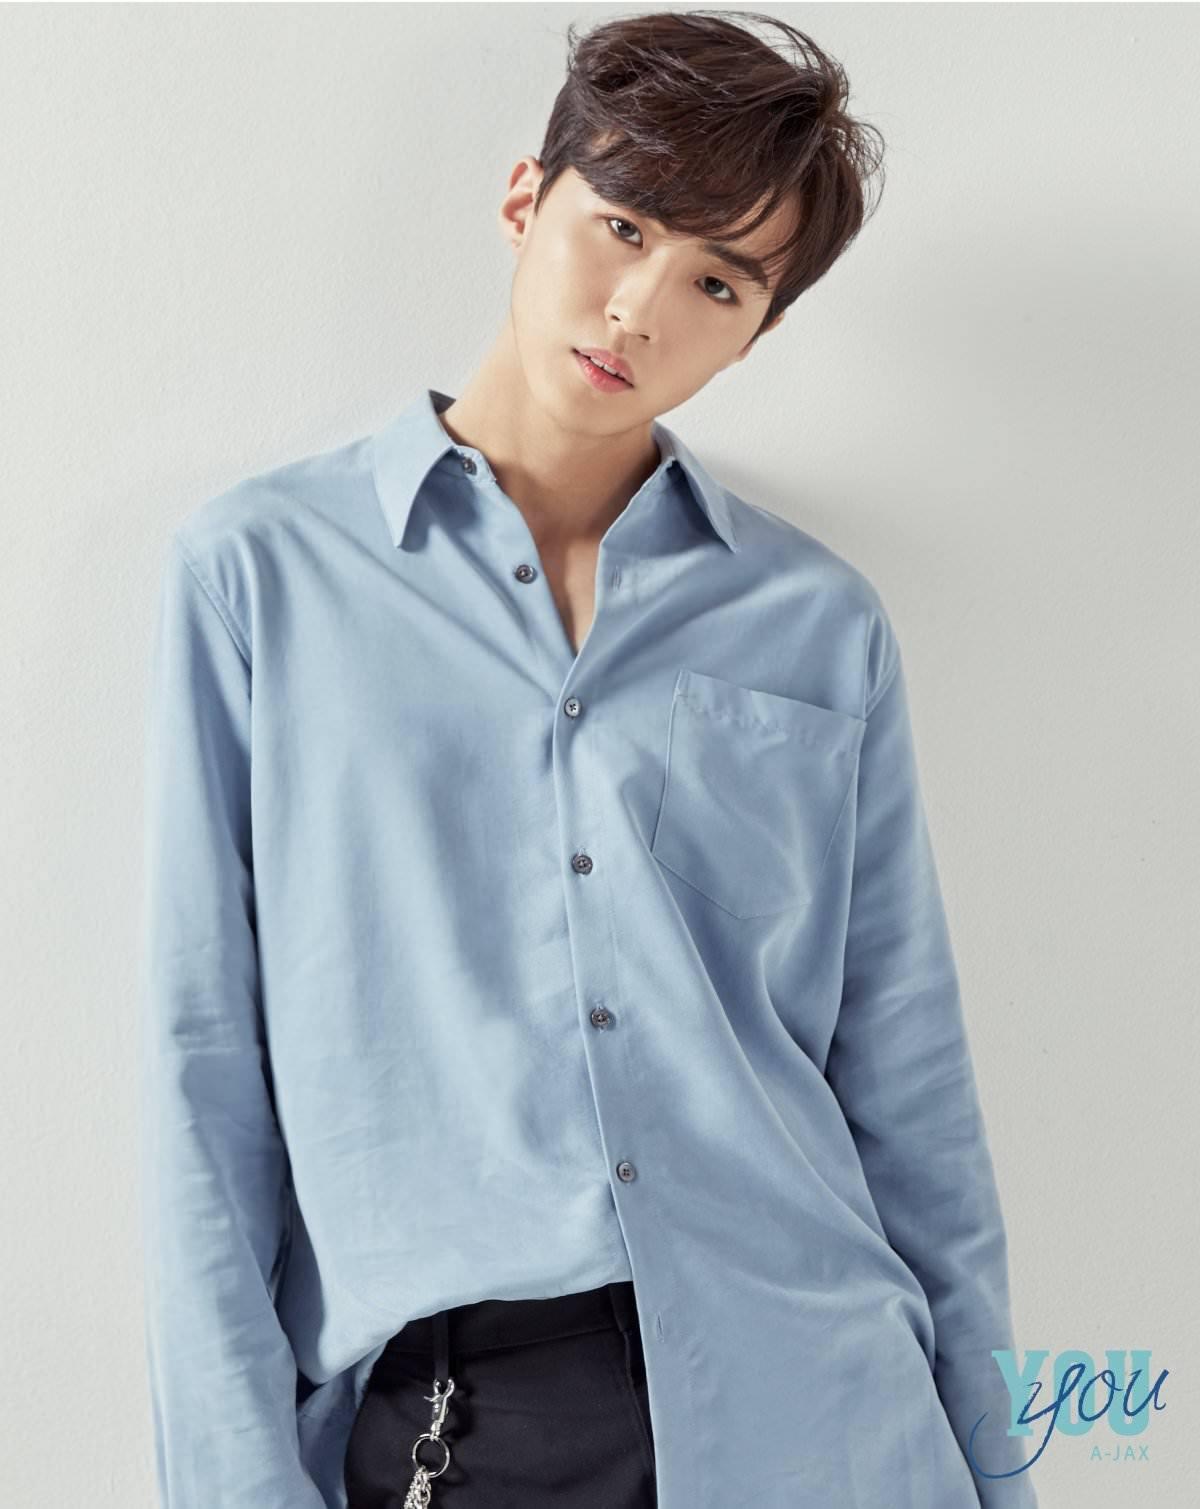 Seungyub profile image